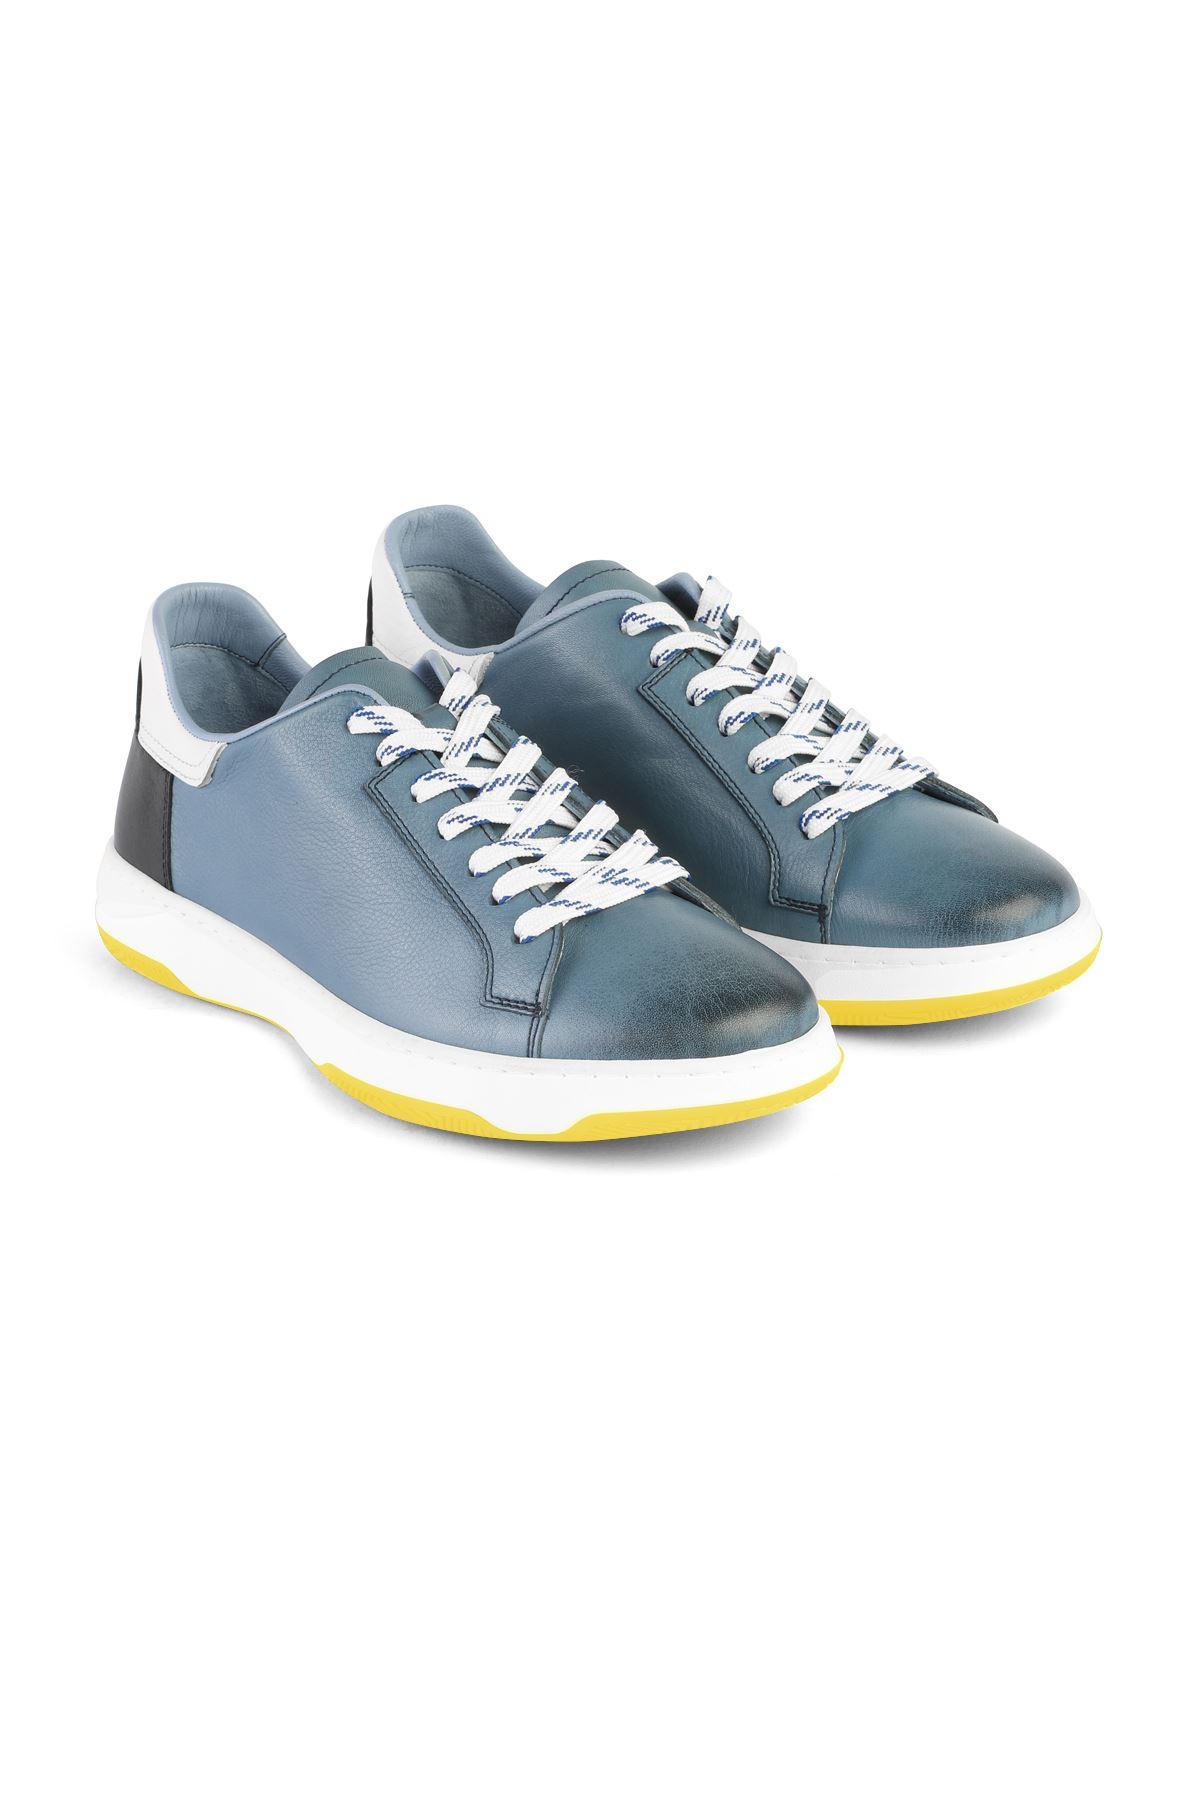 Libero L3227 A. Blue Sports Shoes